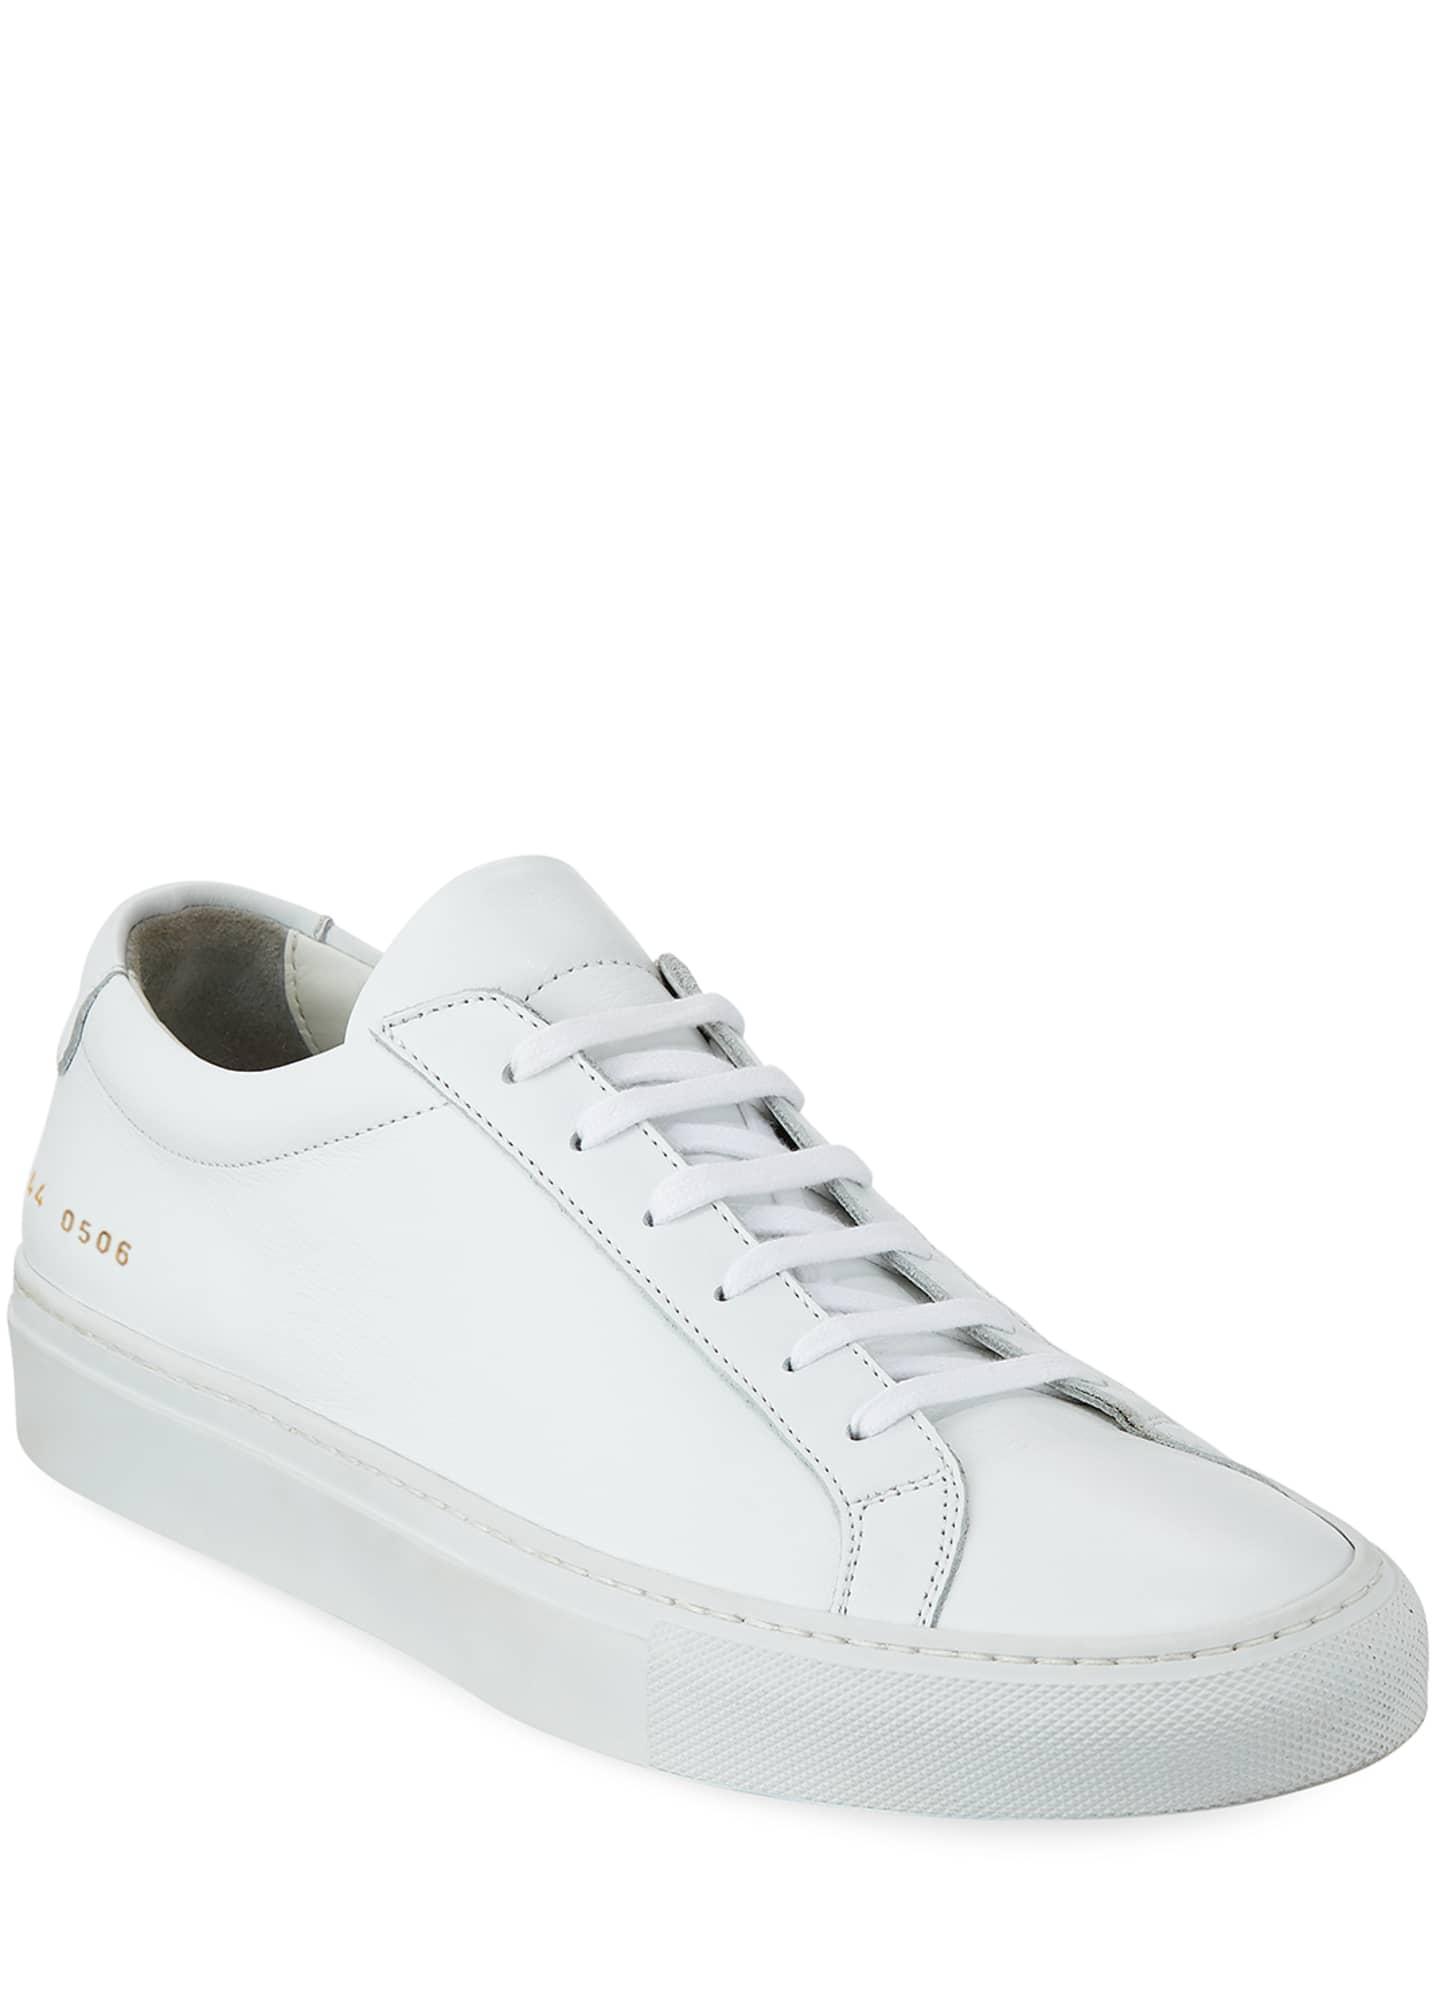 Original Achilles Low in White for Men